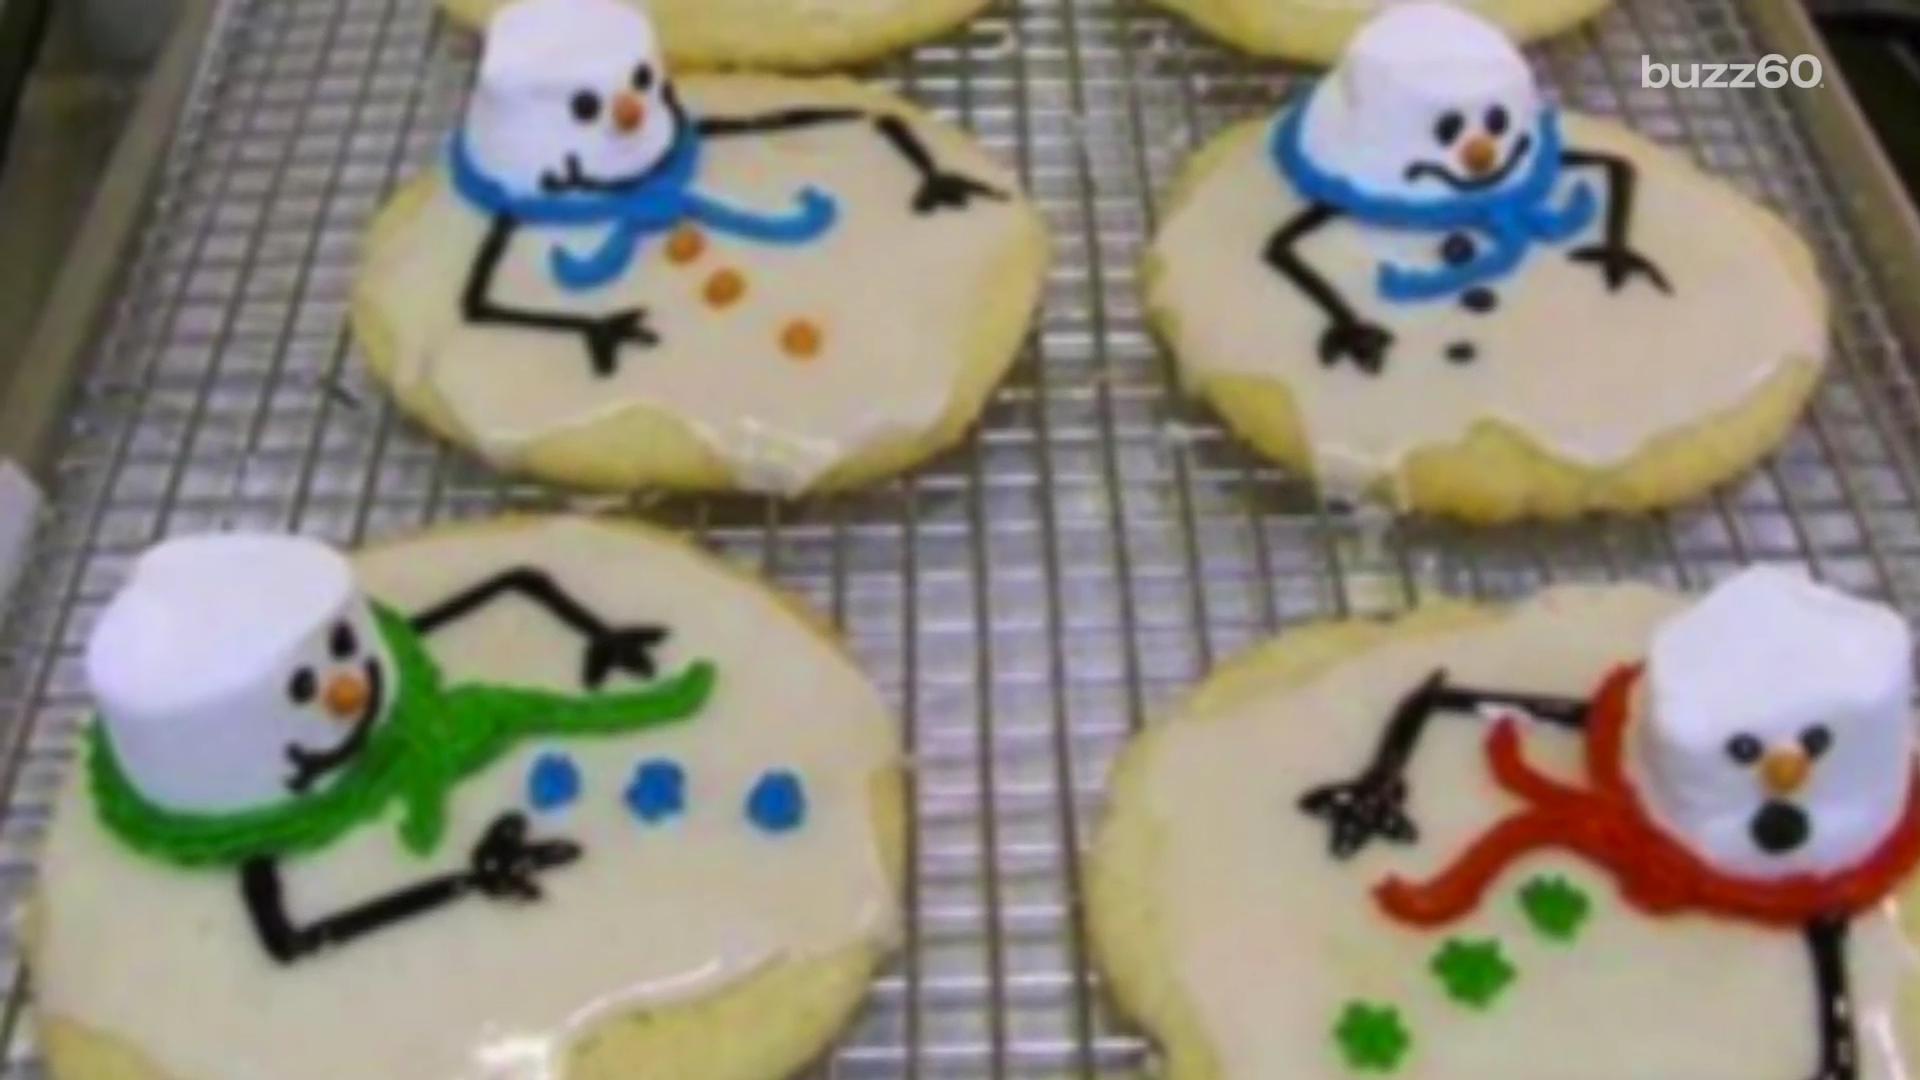 Festive Sugar Cookies for the Holiday Season